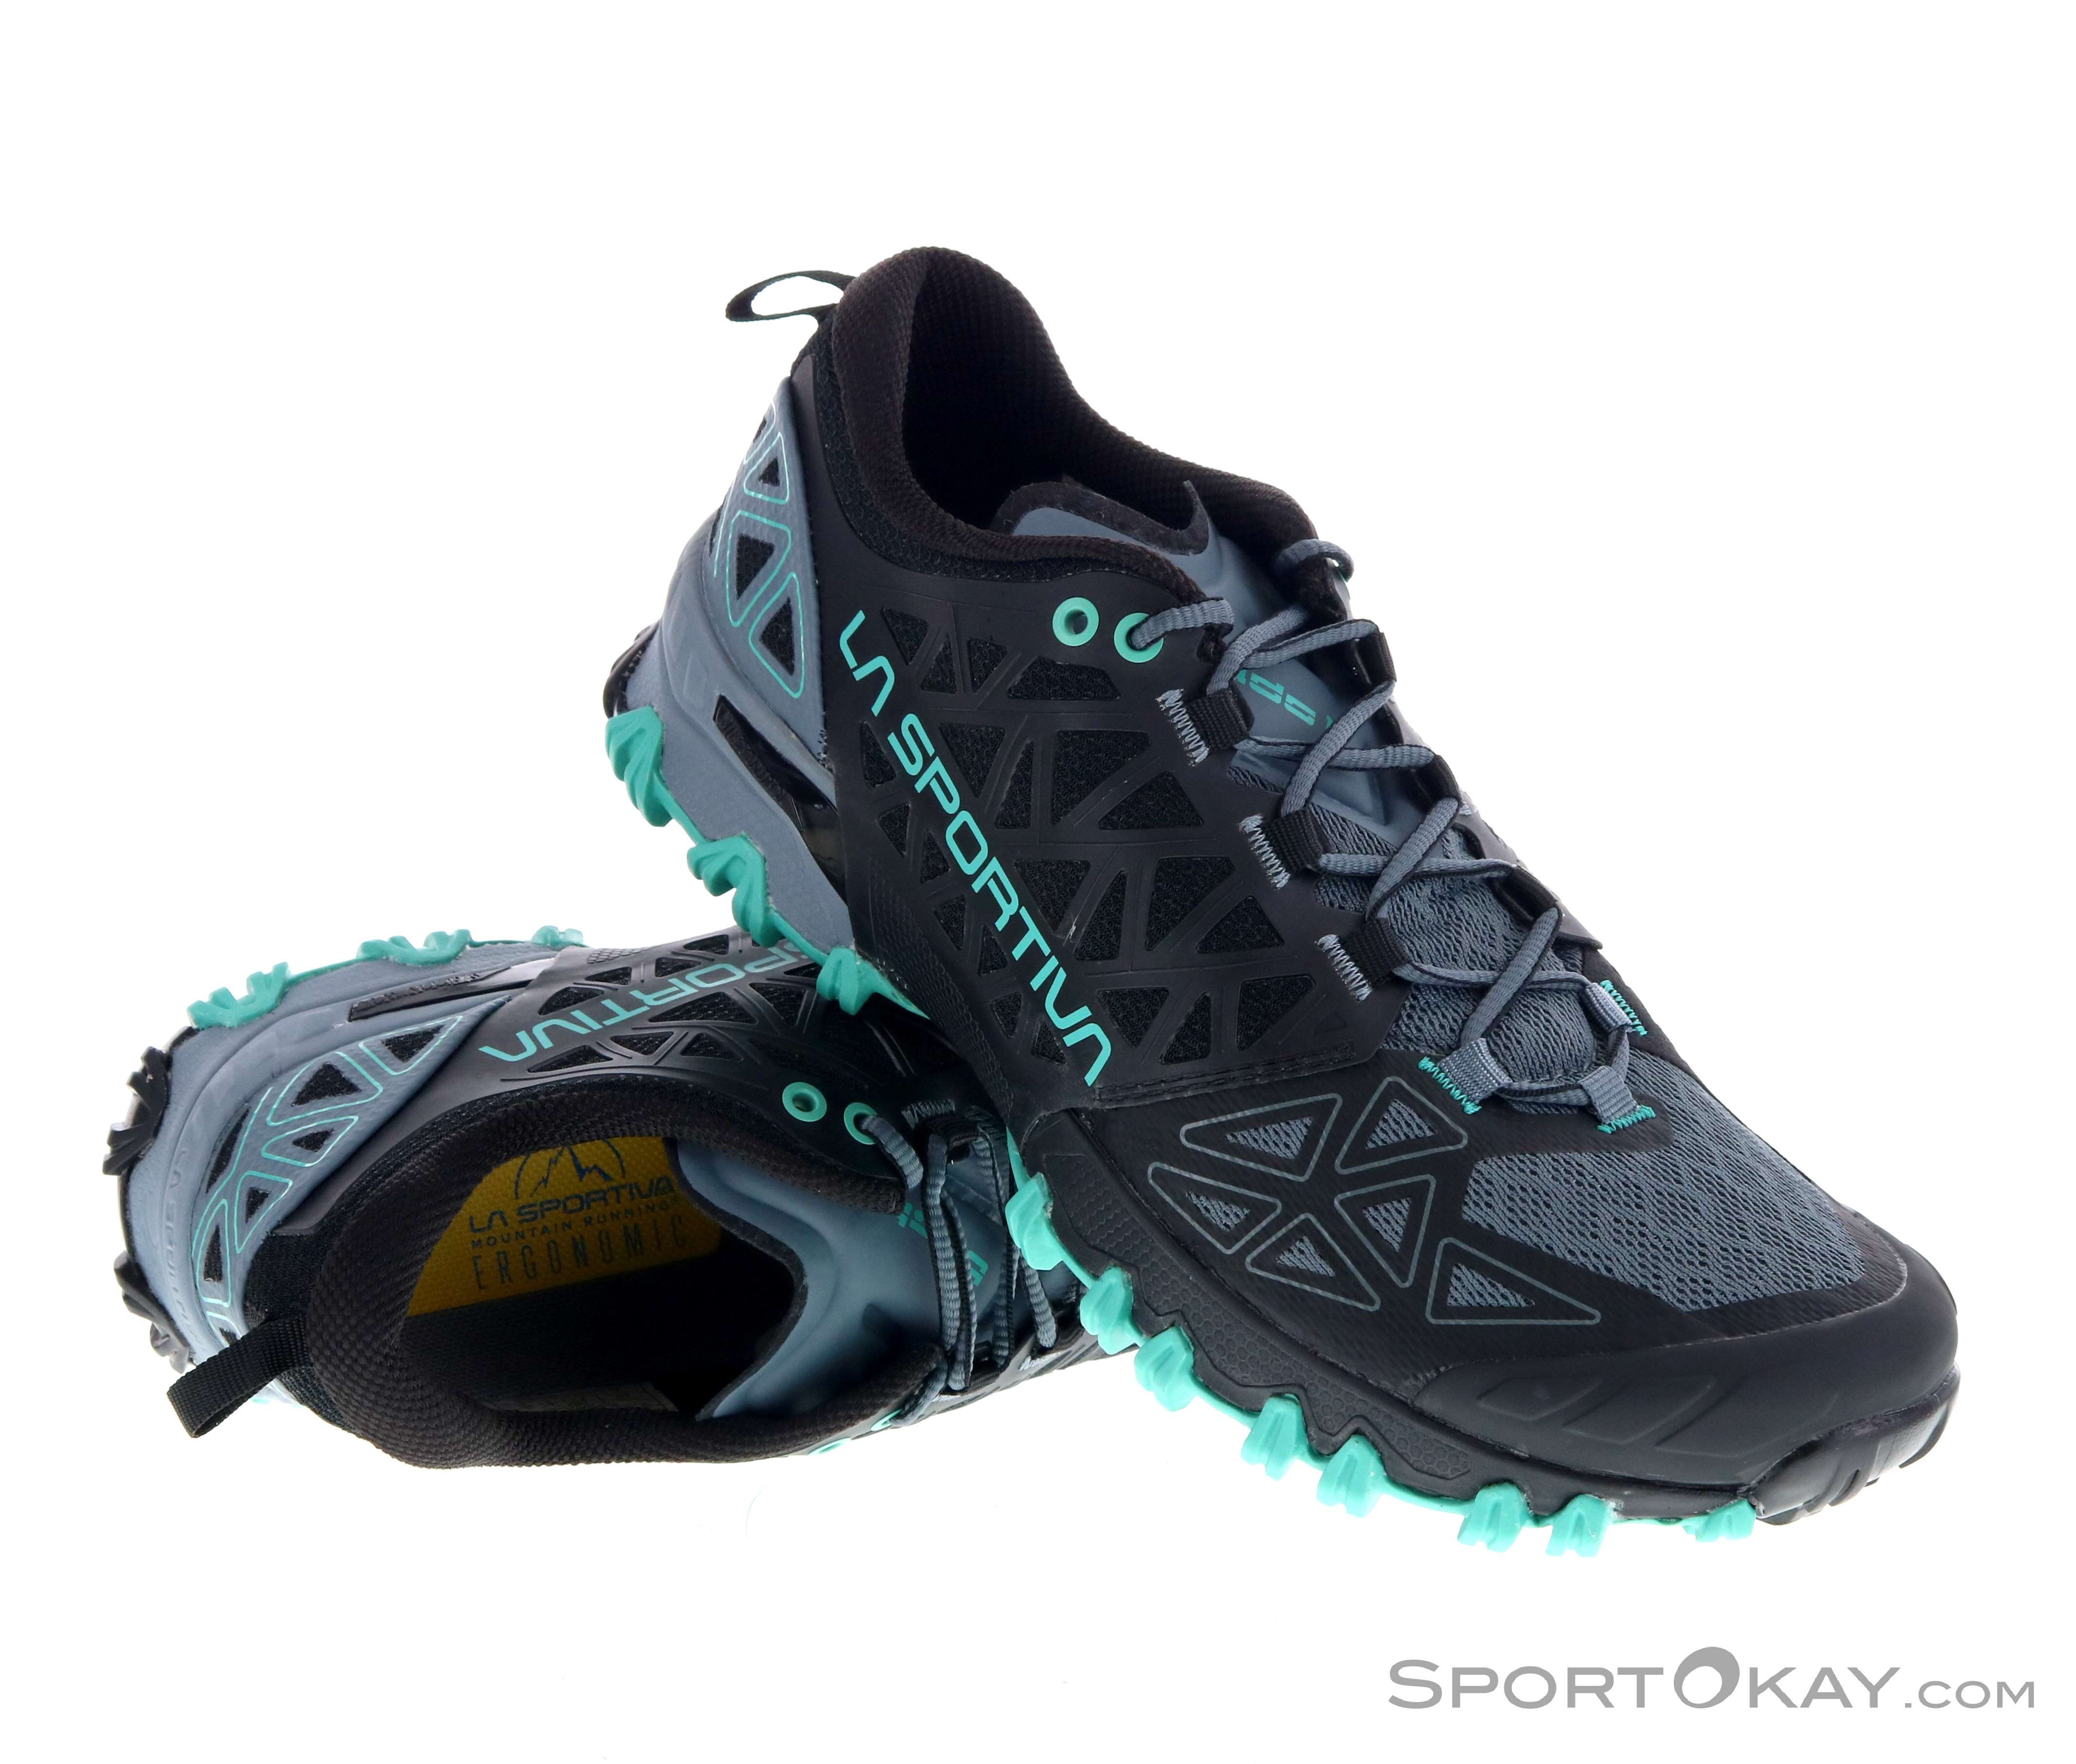 La Sportiva La Sportiva Bushido II Womens Trail Running Shoes